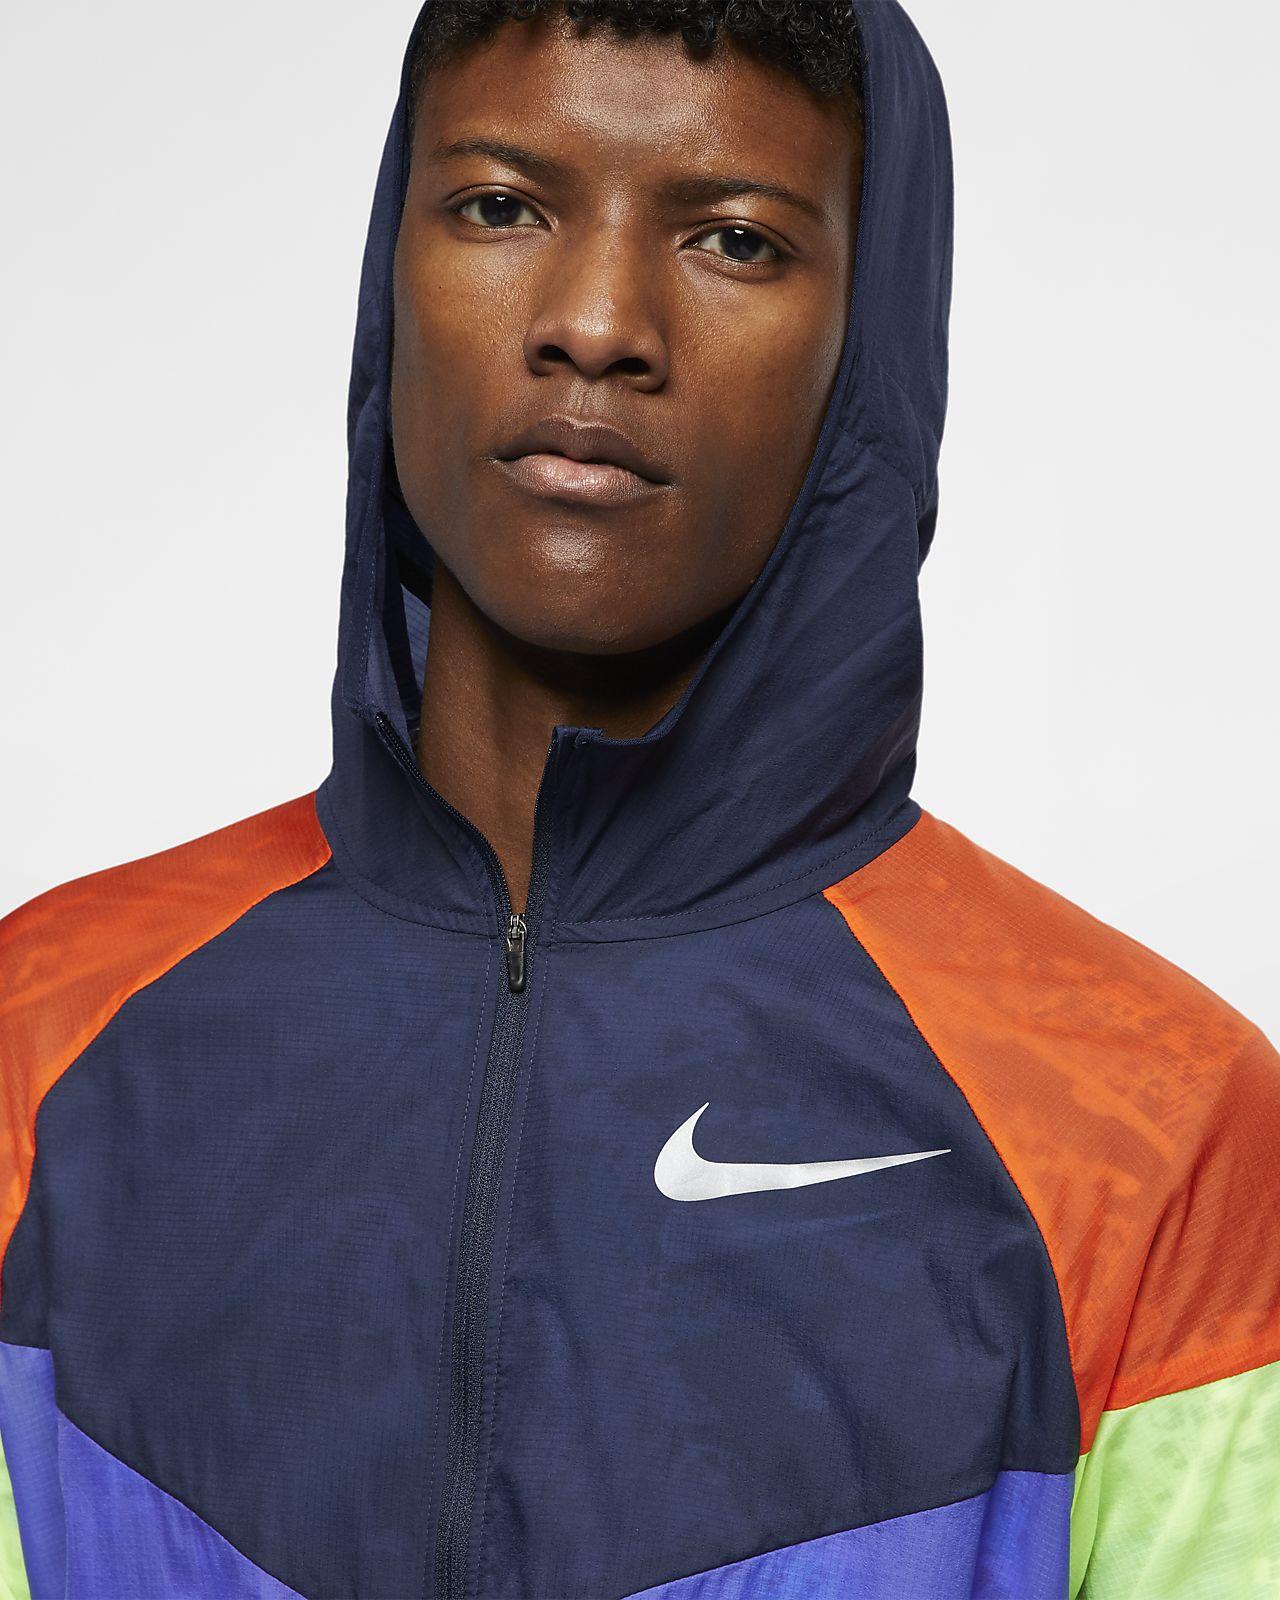 buy popular 99c00 91941 Low Resolution Nike Windrunner Men s Running Jacket Nike Windrunner Men s  Running Jacket